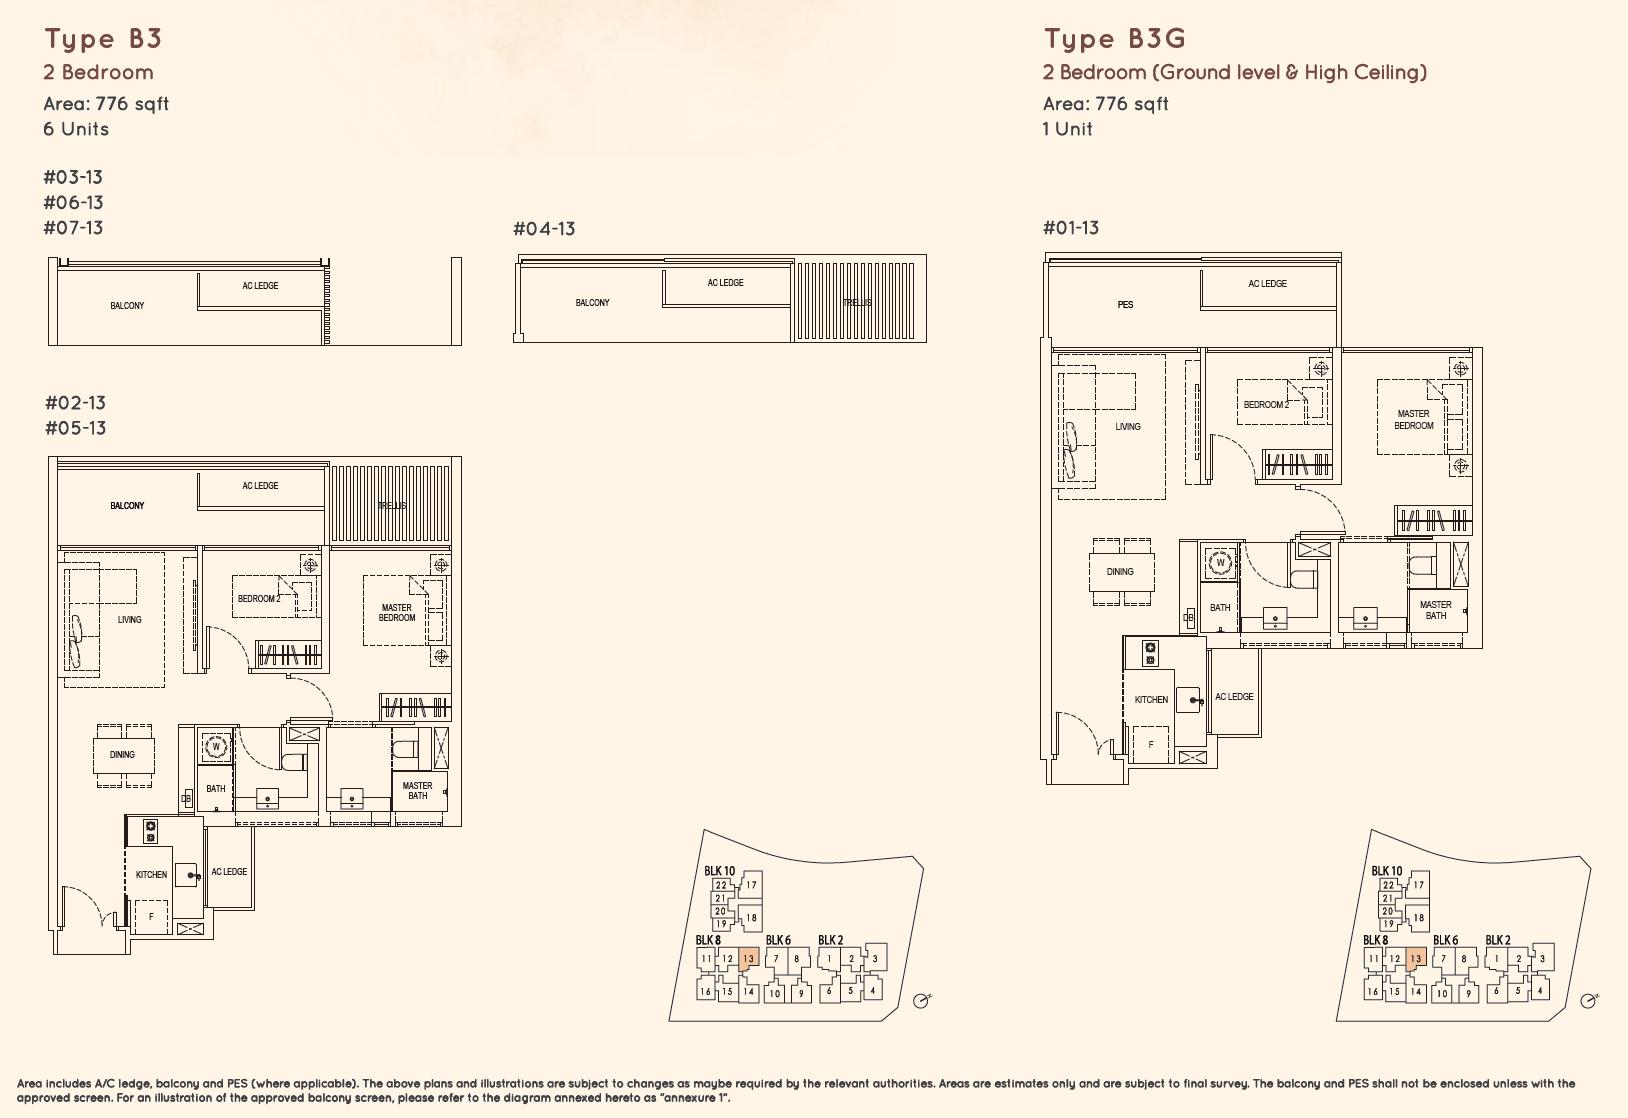 Kandis Residence 2 bedroom floor plan type B3